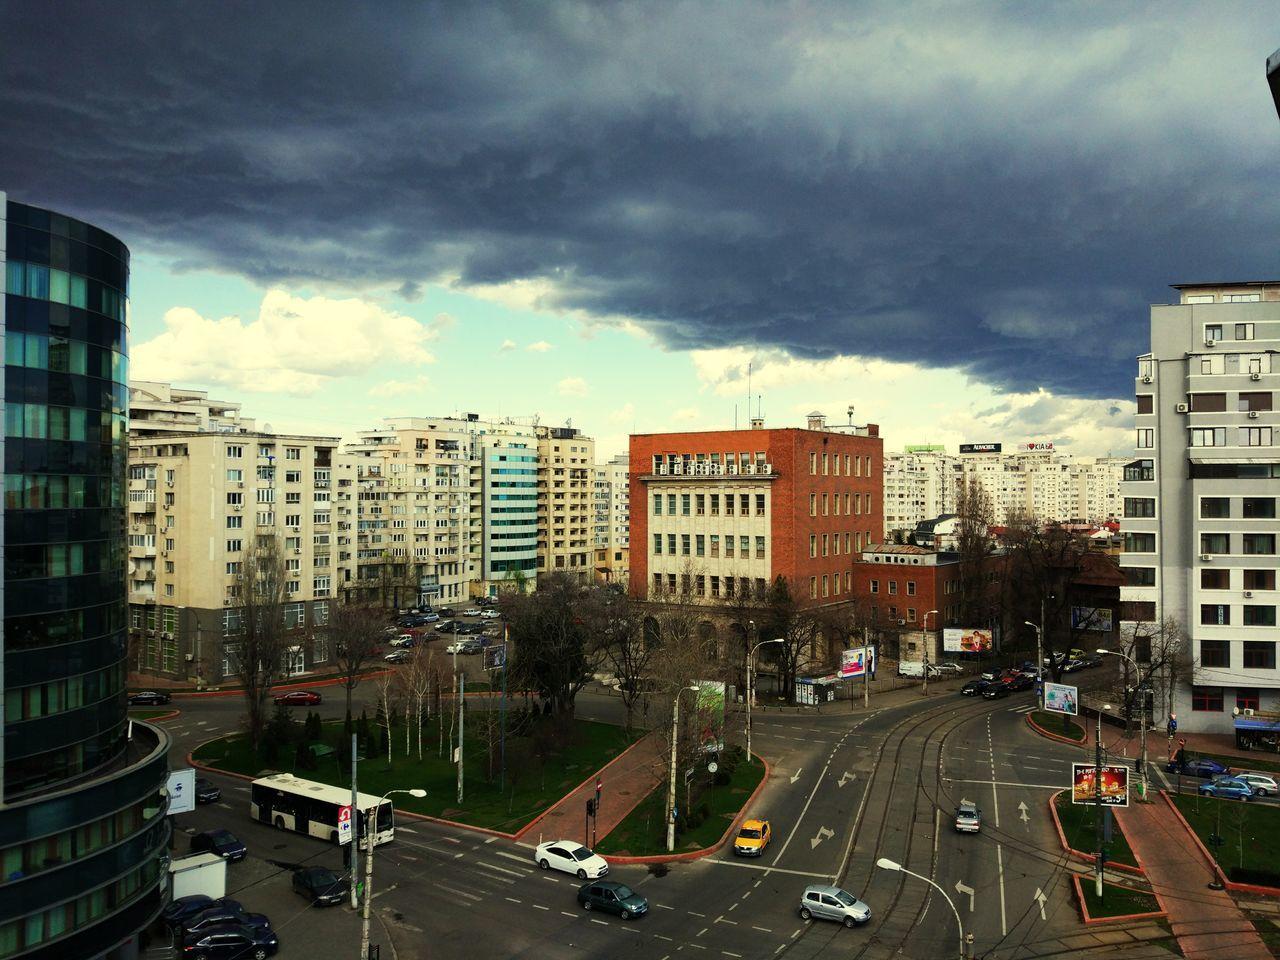 Dark over city